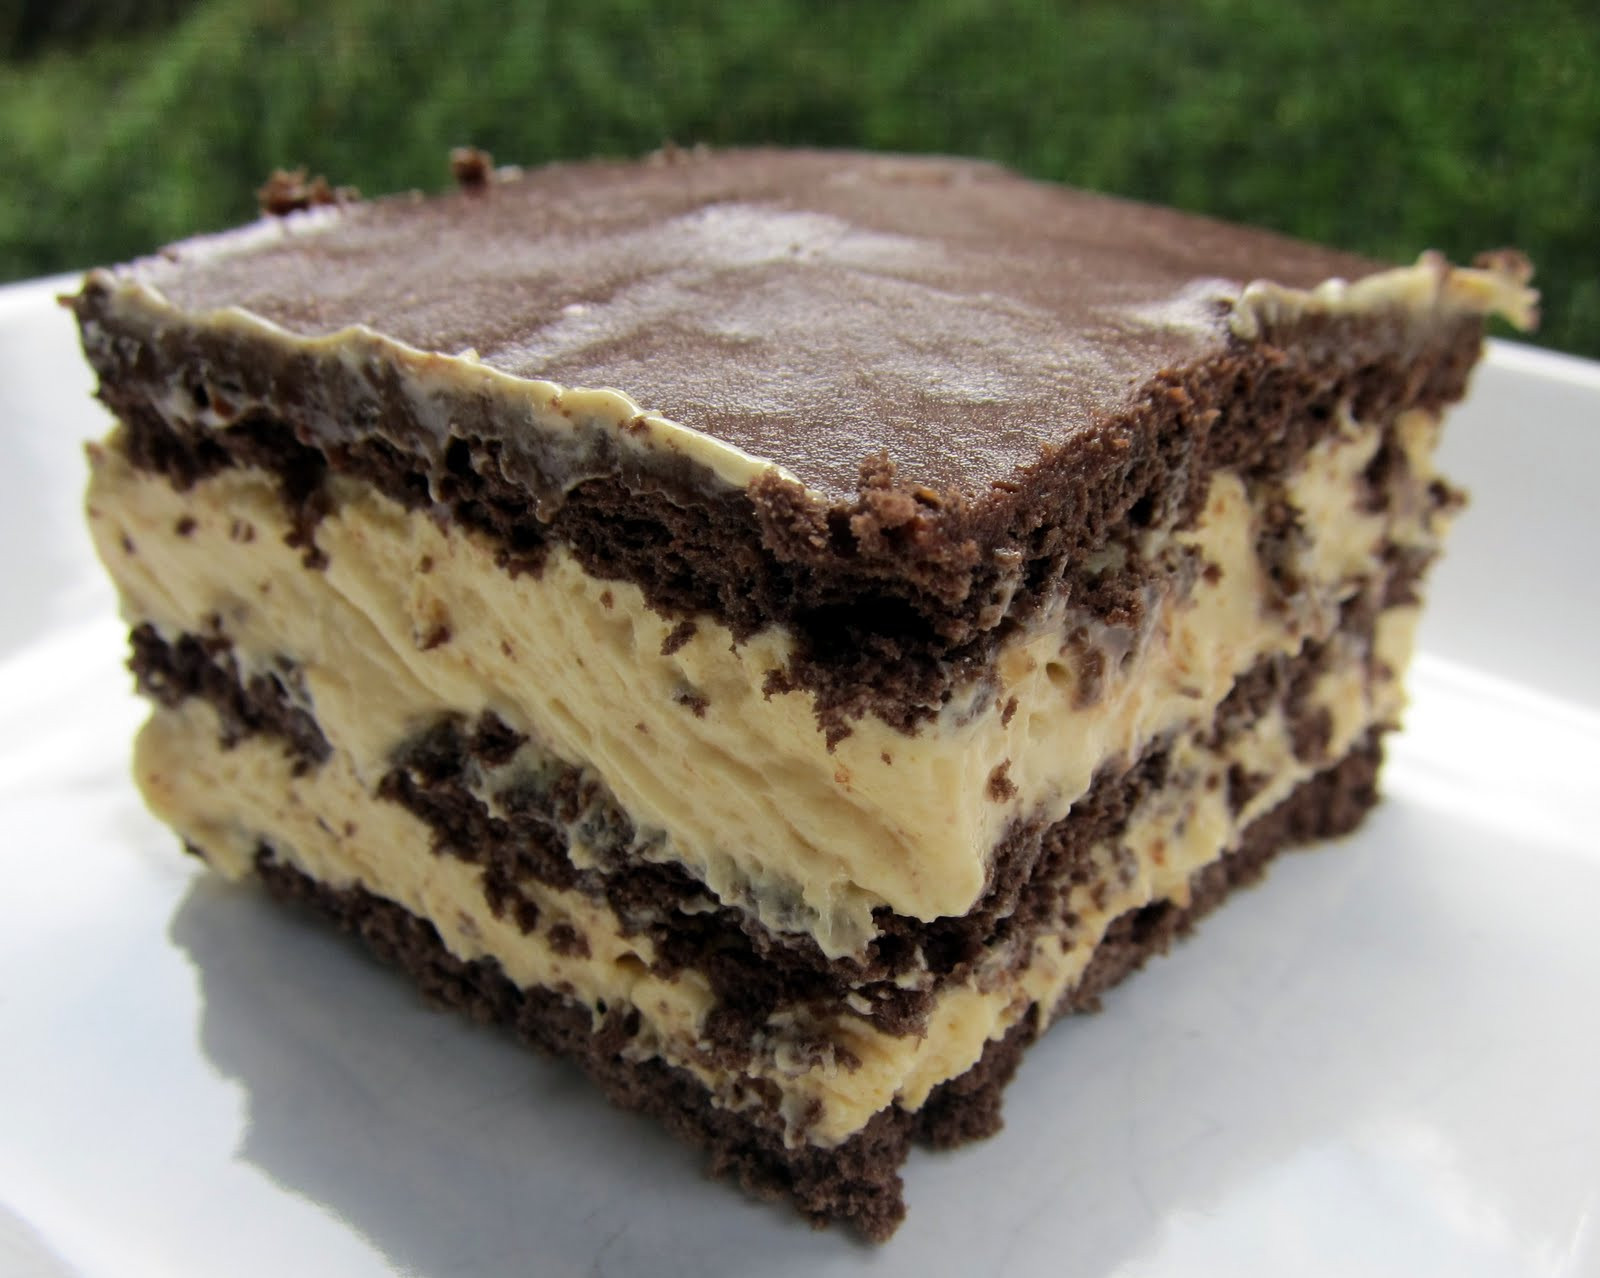 Peanut Butter Dessert  Momma s Daily Relish Peanut Butter Eclair Cake